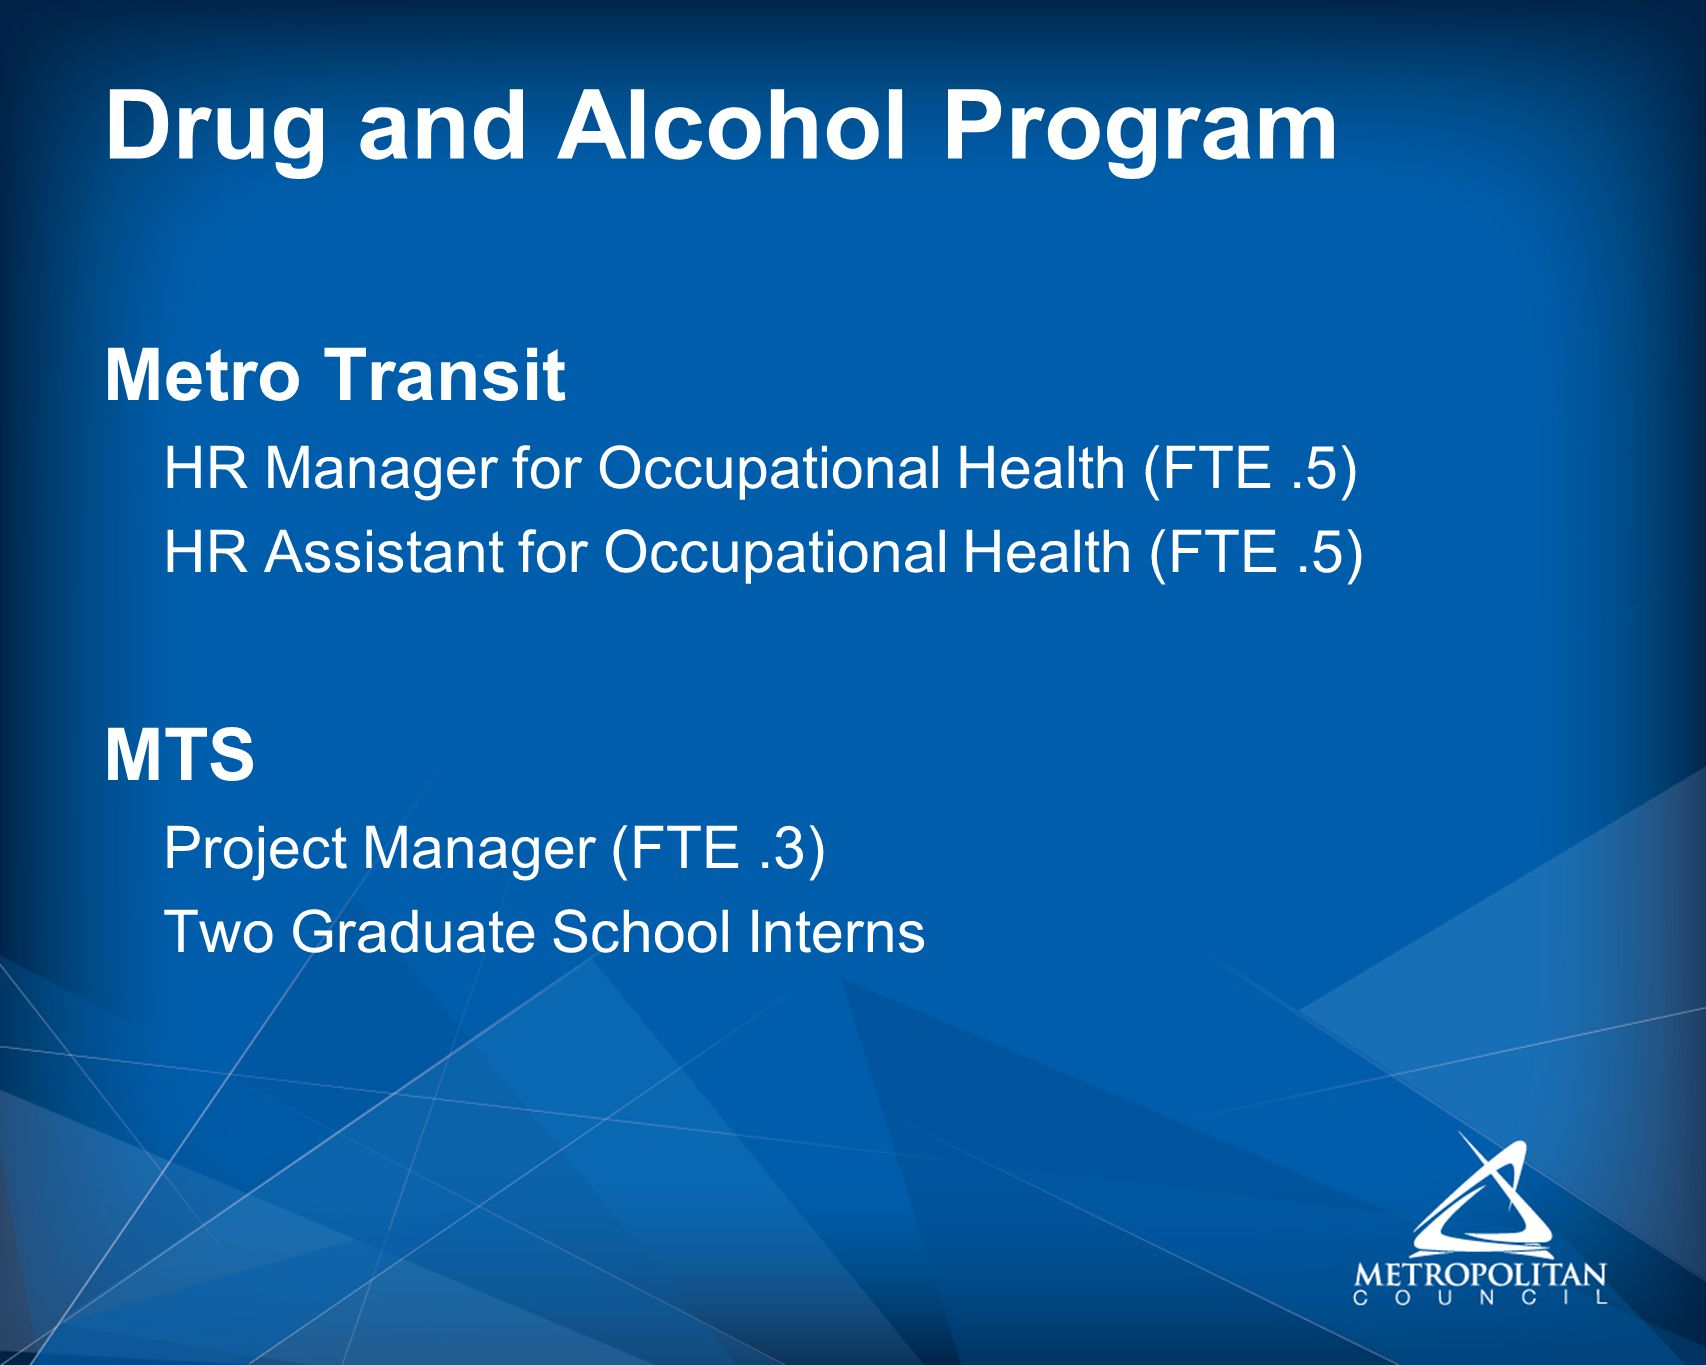 Drug and Alcohol Program Metro Transit HR Manager for Occupational Health (FTE.5) HR Assistant for Occupational Health (FTE.5) MTS Project Manager (FT